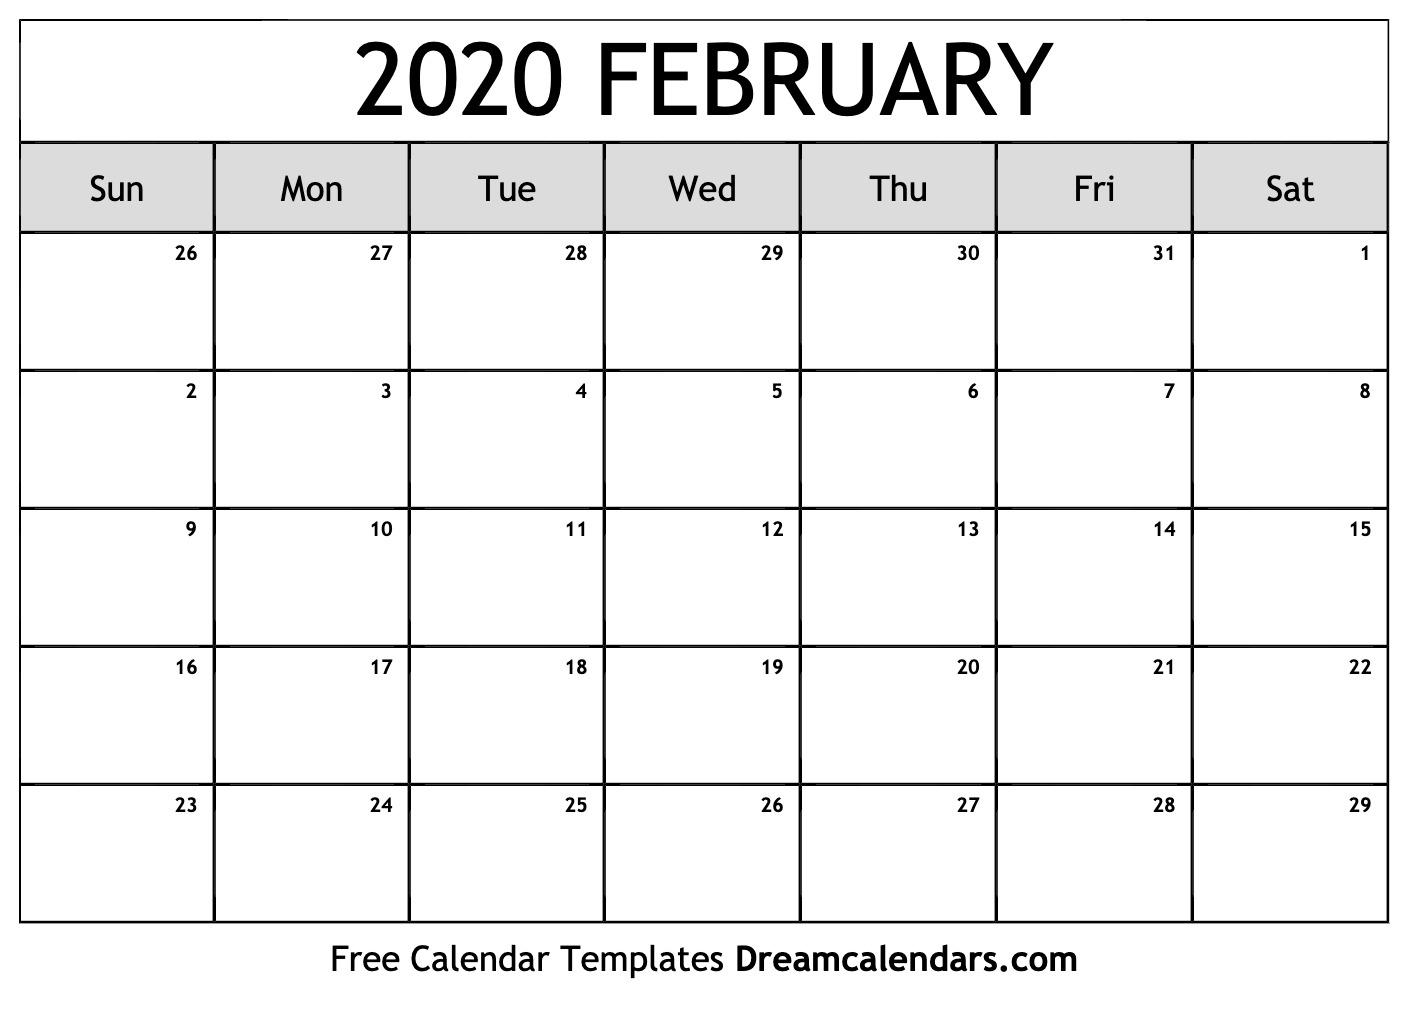 Monthly Calendar February 2020 Printable  Bolan inside December 2020 Calendar Beta Calendars